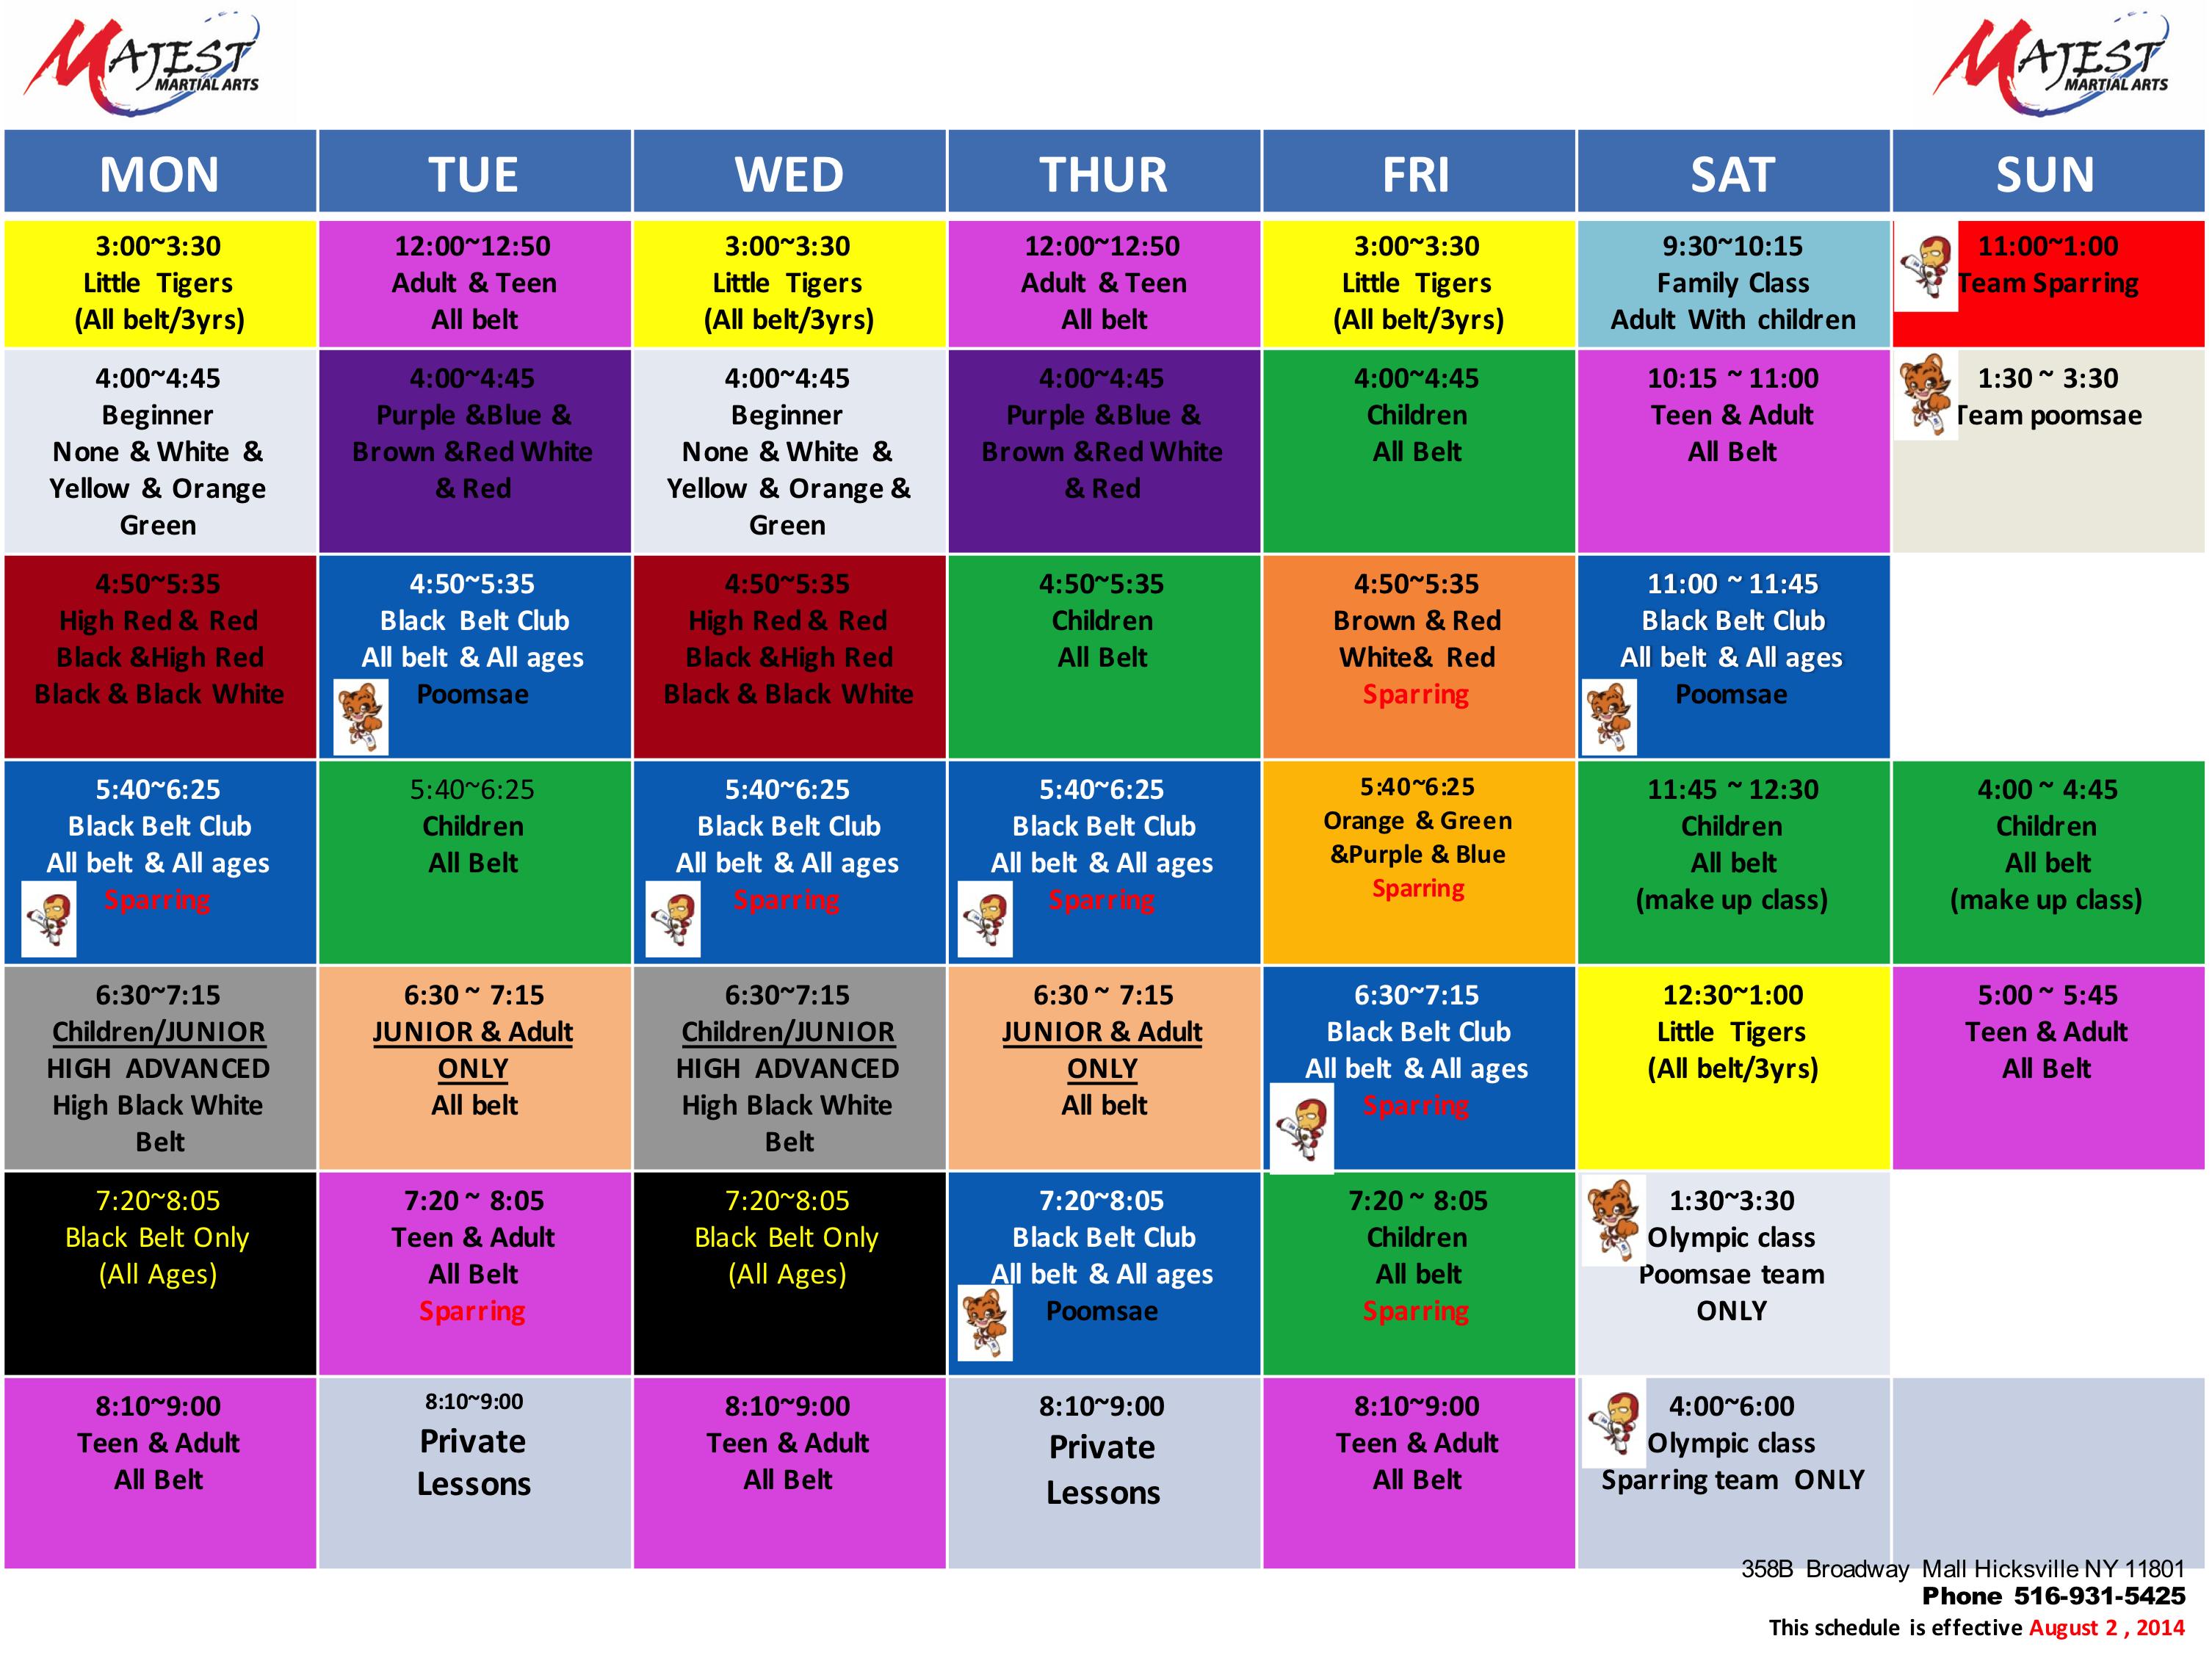 Team Pro MBA Majest Hicksville NY Class Schedule